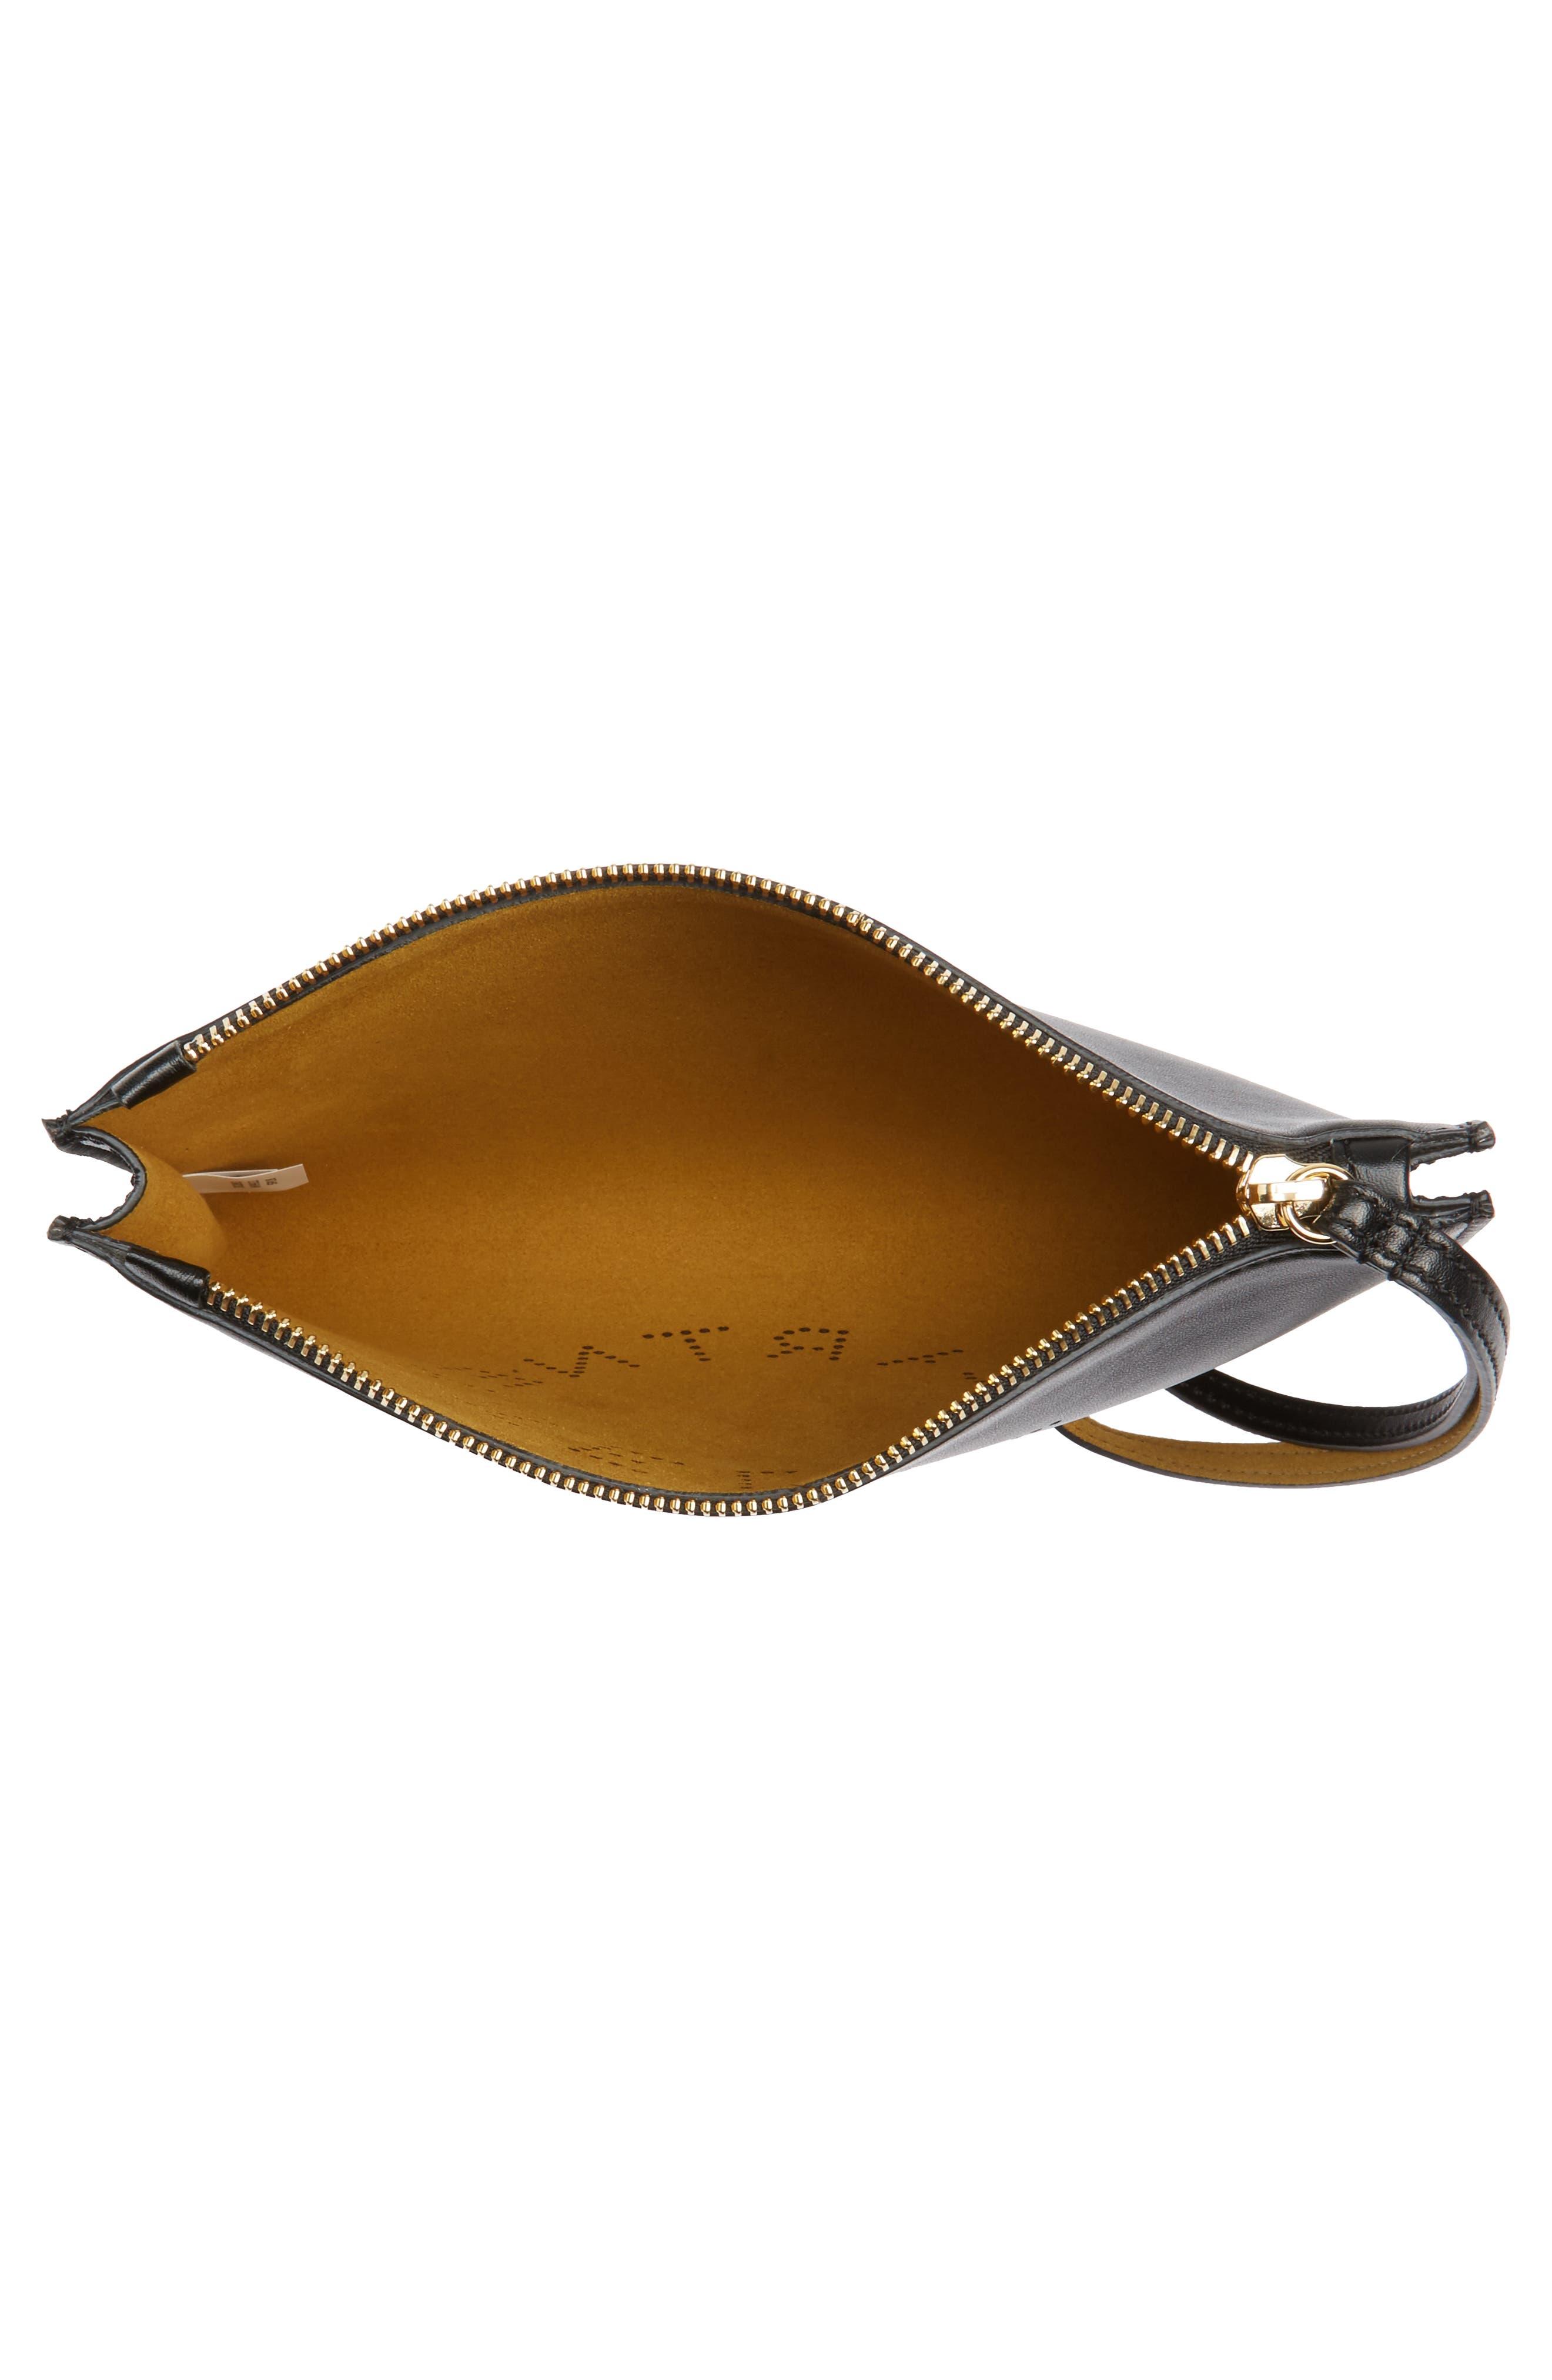 Alter Faux Nappa Leather Wristlet Clutch,                             Alternate thumbnail 4, color,                             BLACK